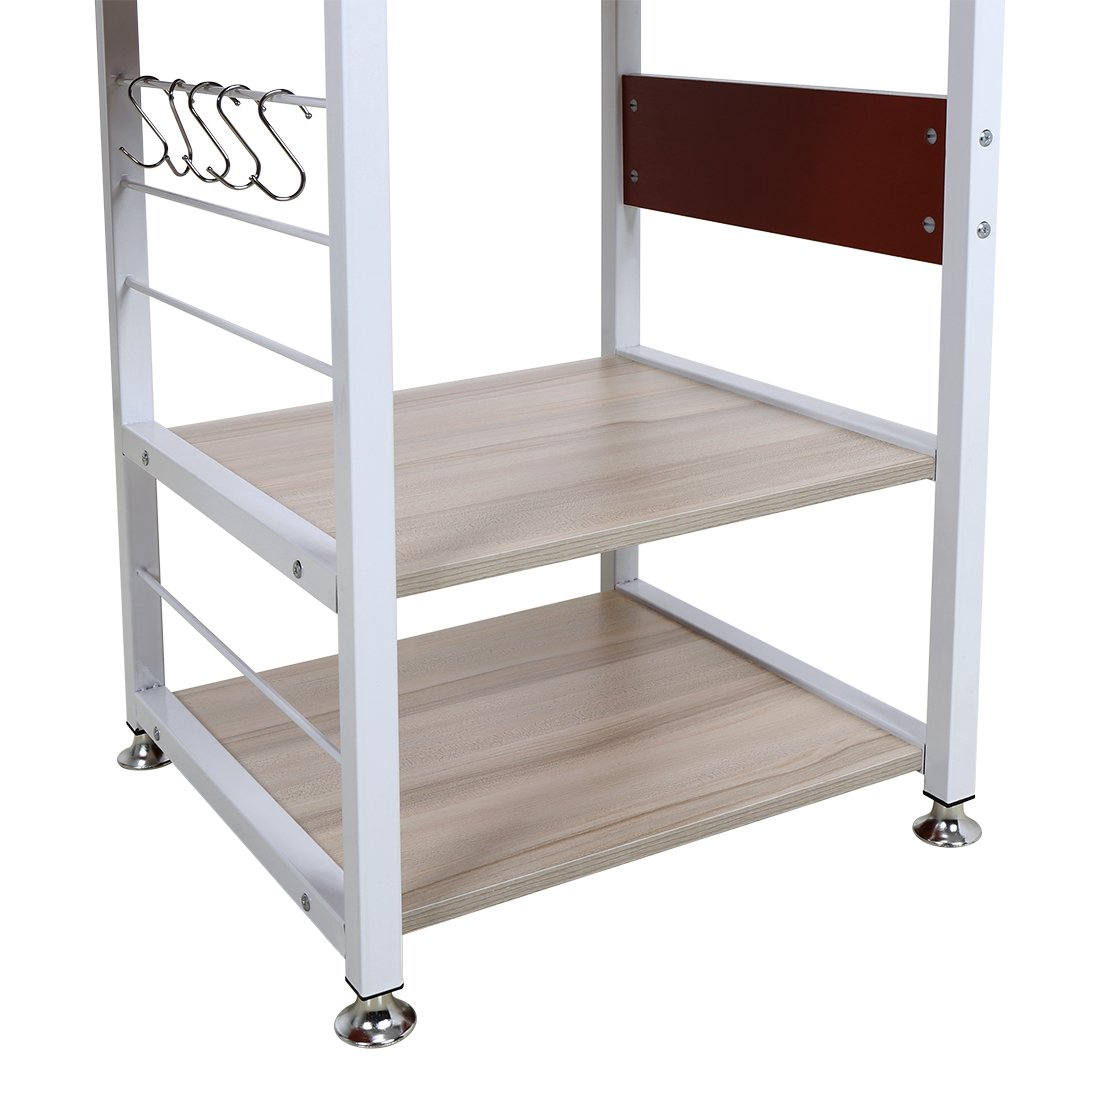 4 Tier Multipurpose Storage Shelf Bakers Rack, Metal Frame and Wooden Worktop for Kitchen by BestValue GO (Image #4)